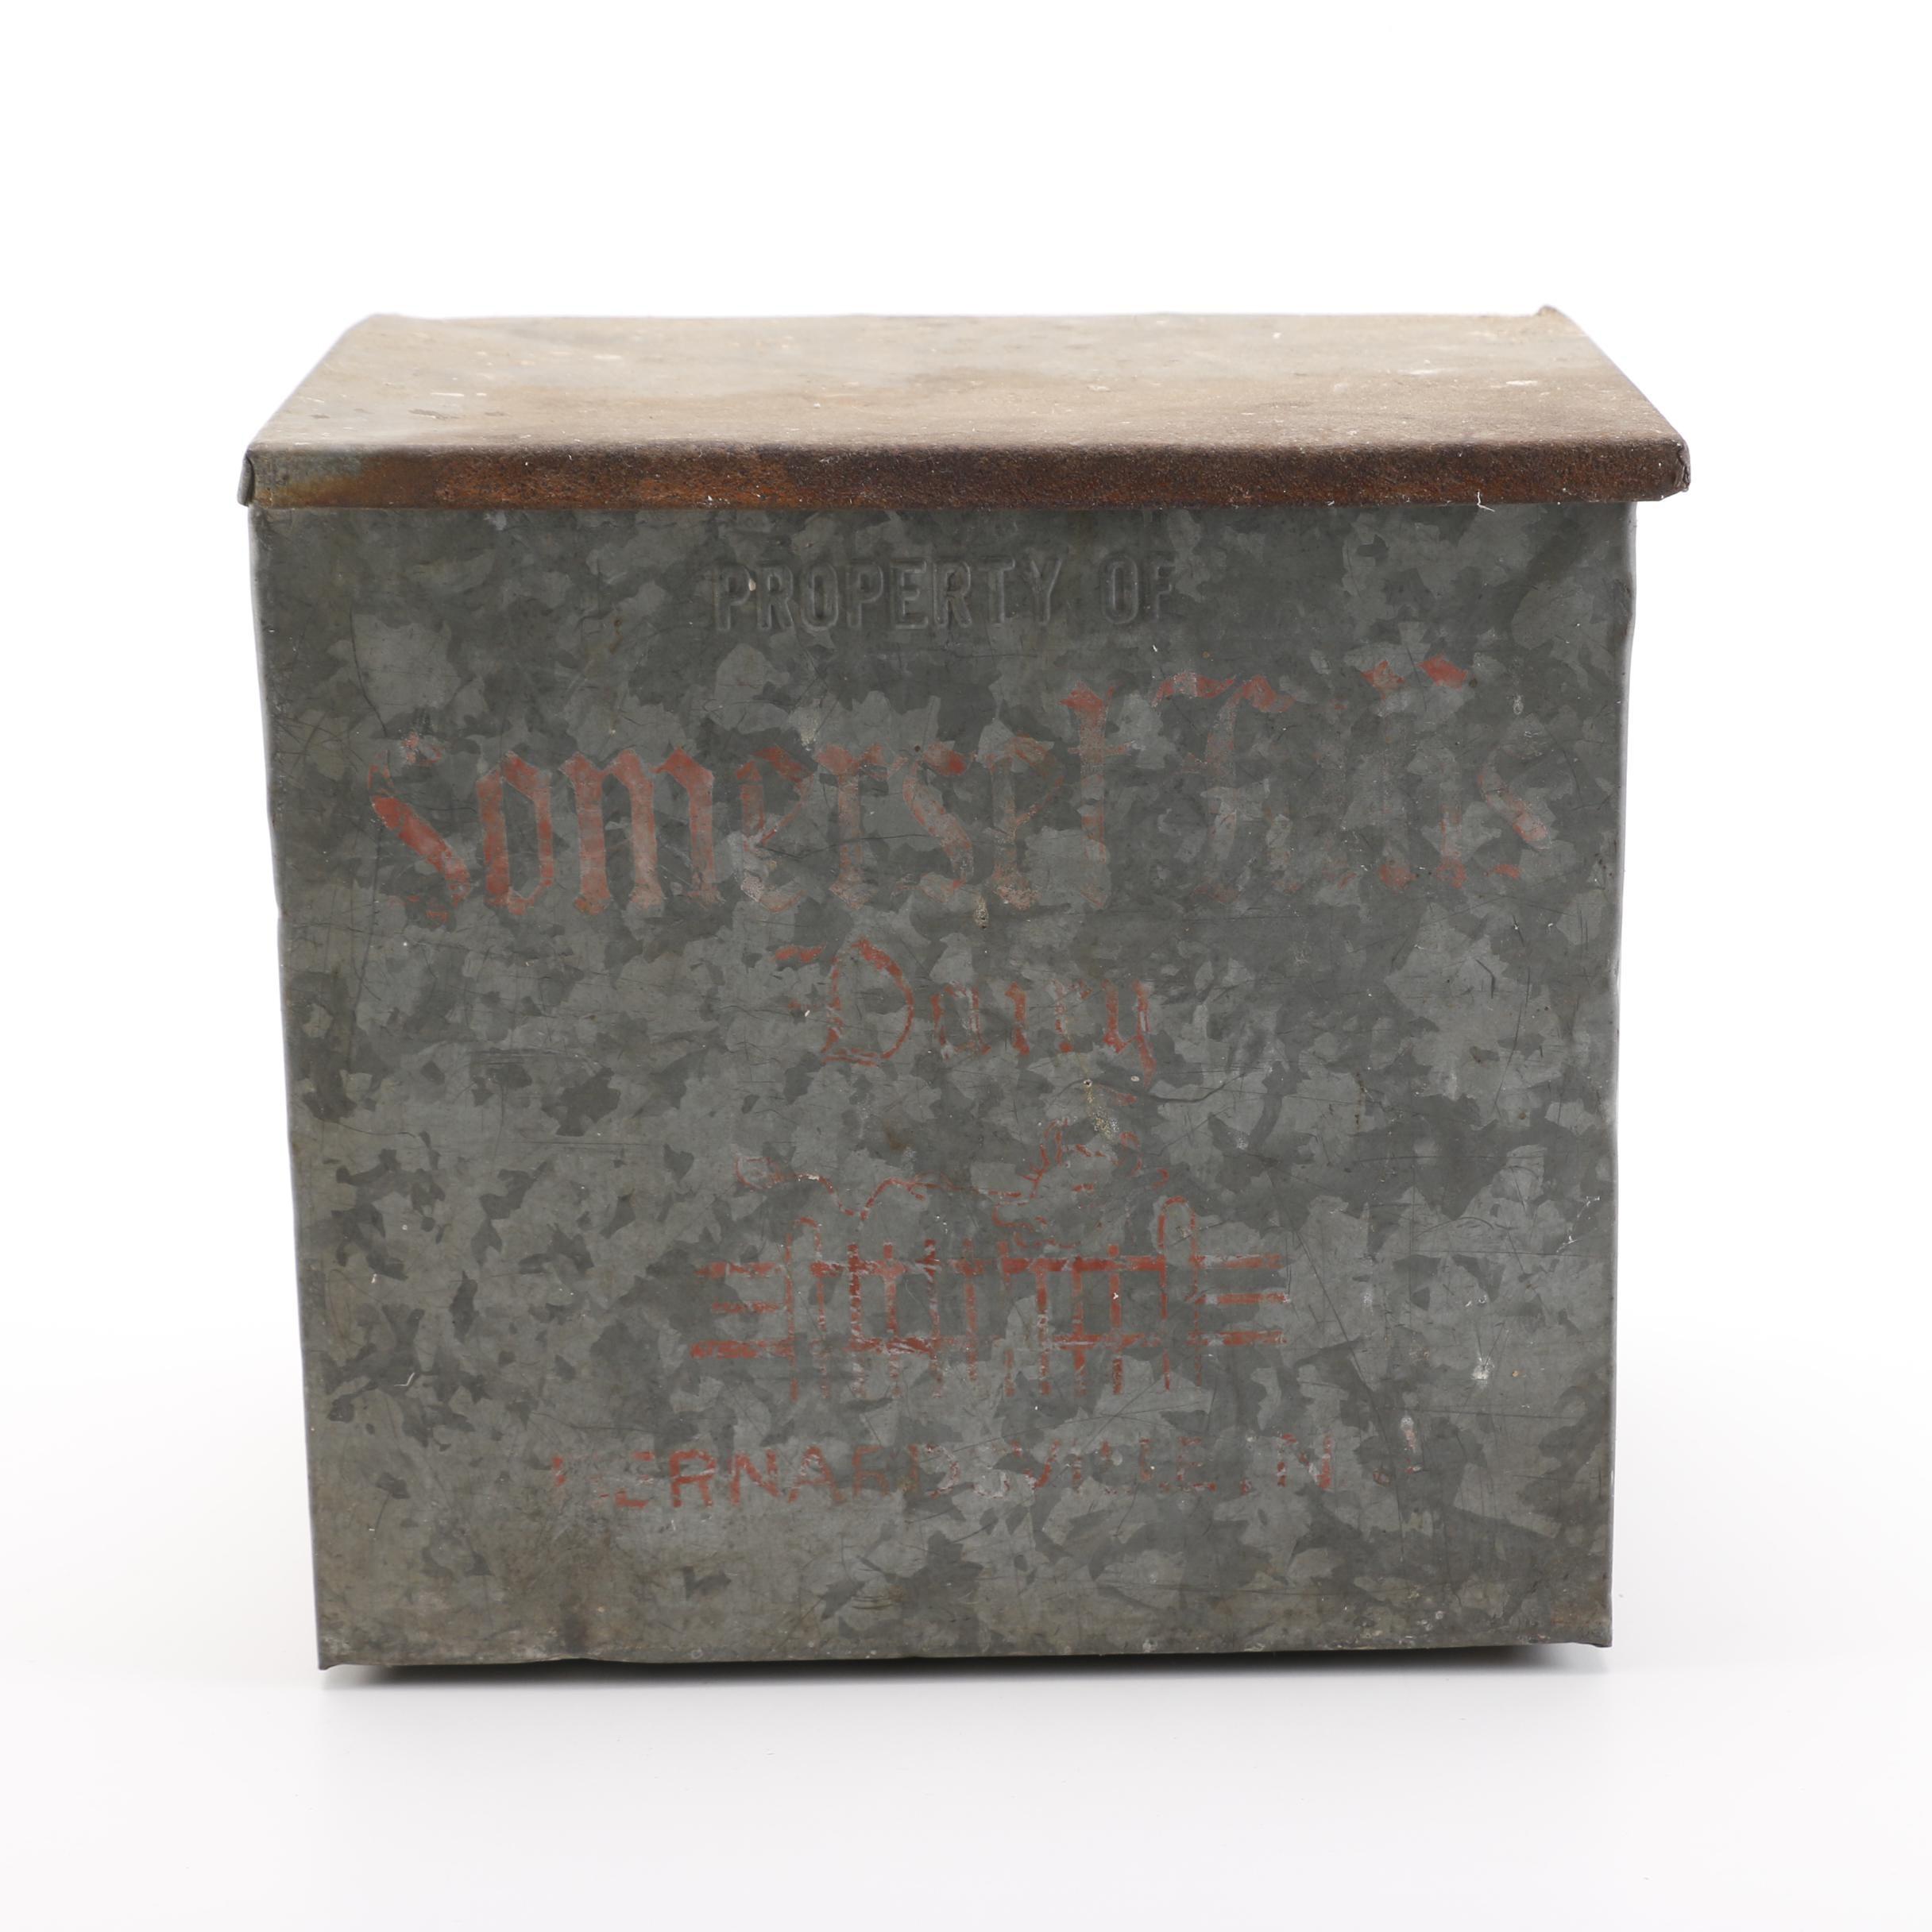 Vintage Metal Dairy Delivery Box